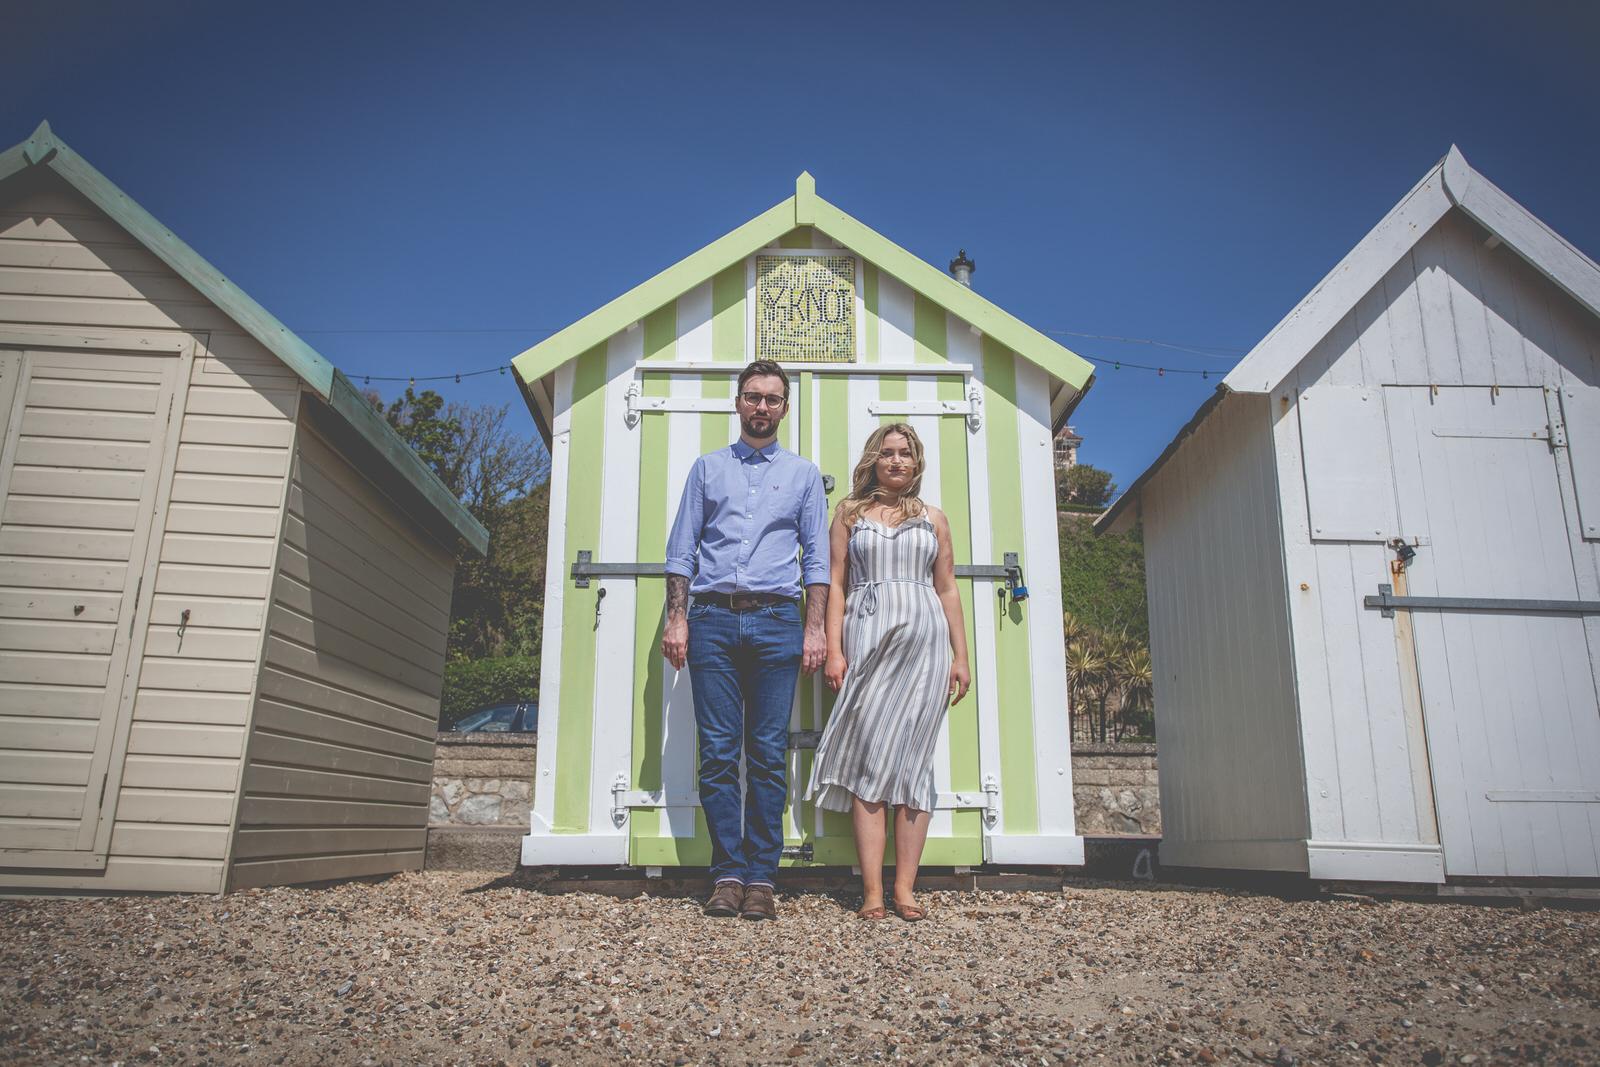 Felixstowe Beachfront Engagement - Sinead  Ryan - 030.jpg